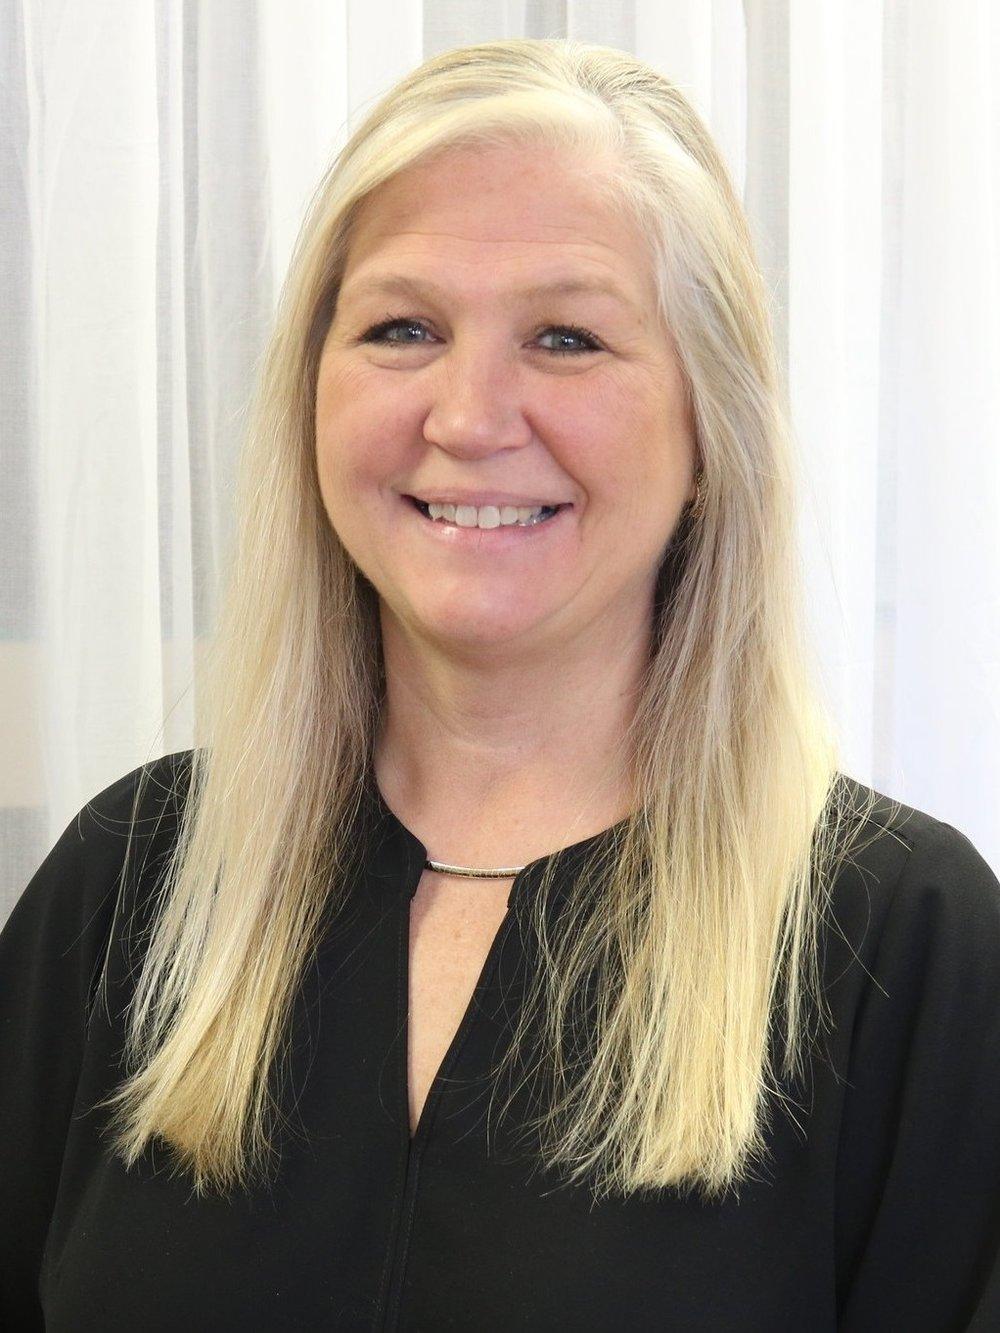 SUSANJOHNSON - MMH Staging Coordinator